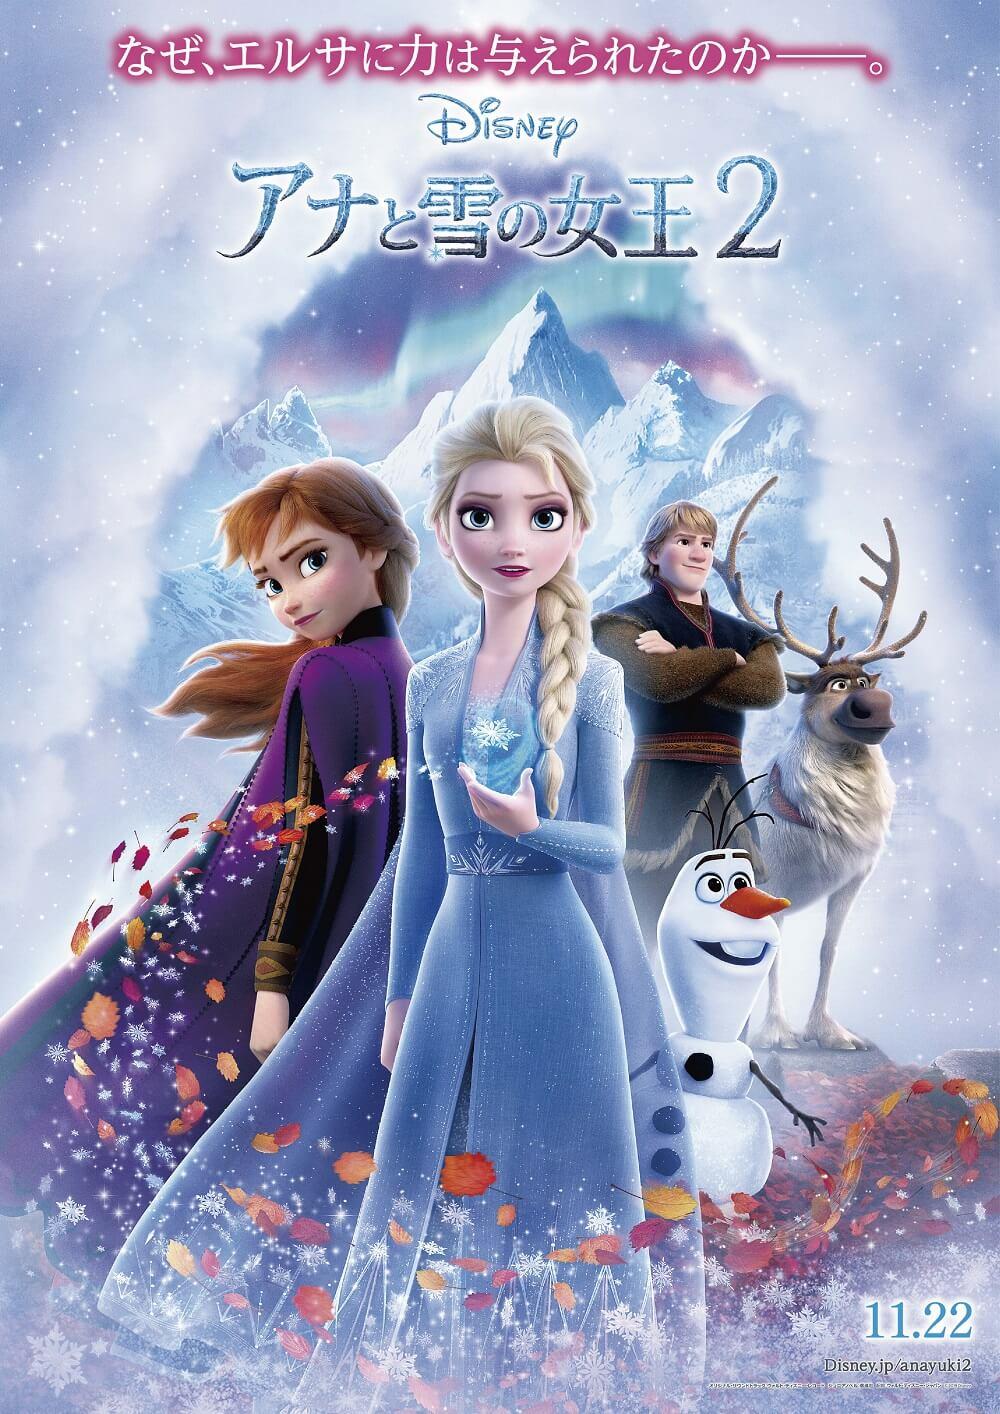 Regarder La Reine des neiges | Film complet | Disney+